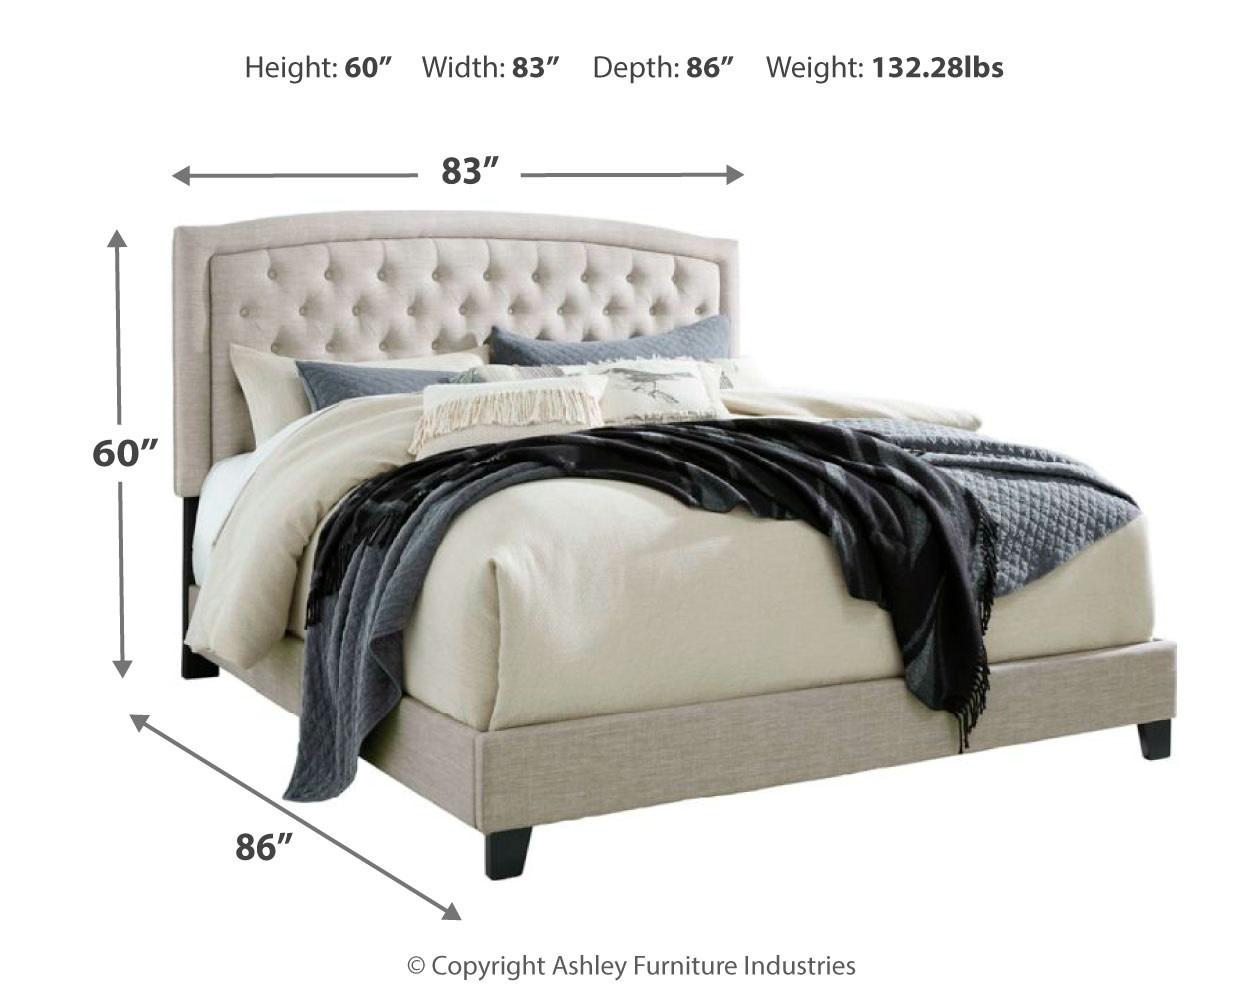 Signature Design KING- Jerary- Light Gray Upholstered Bed- B090-782